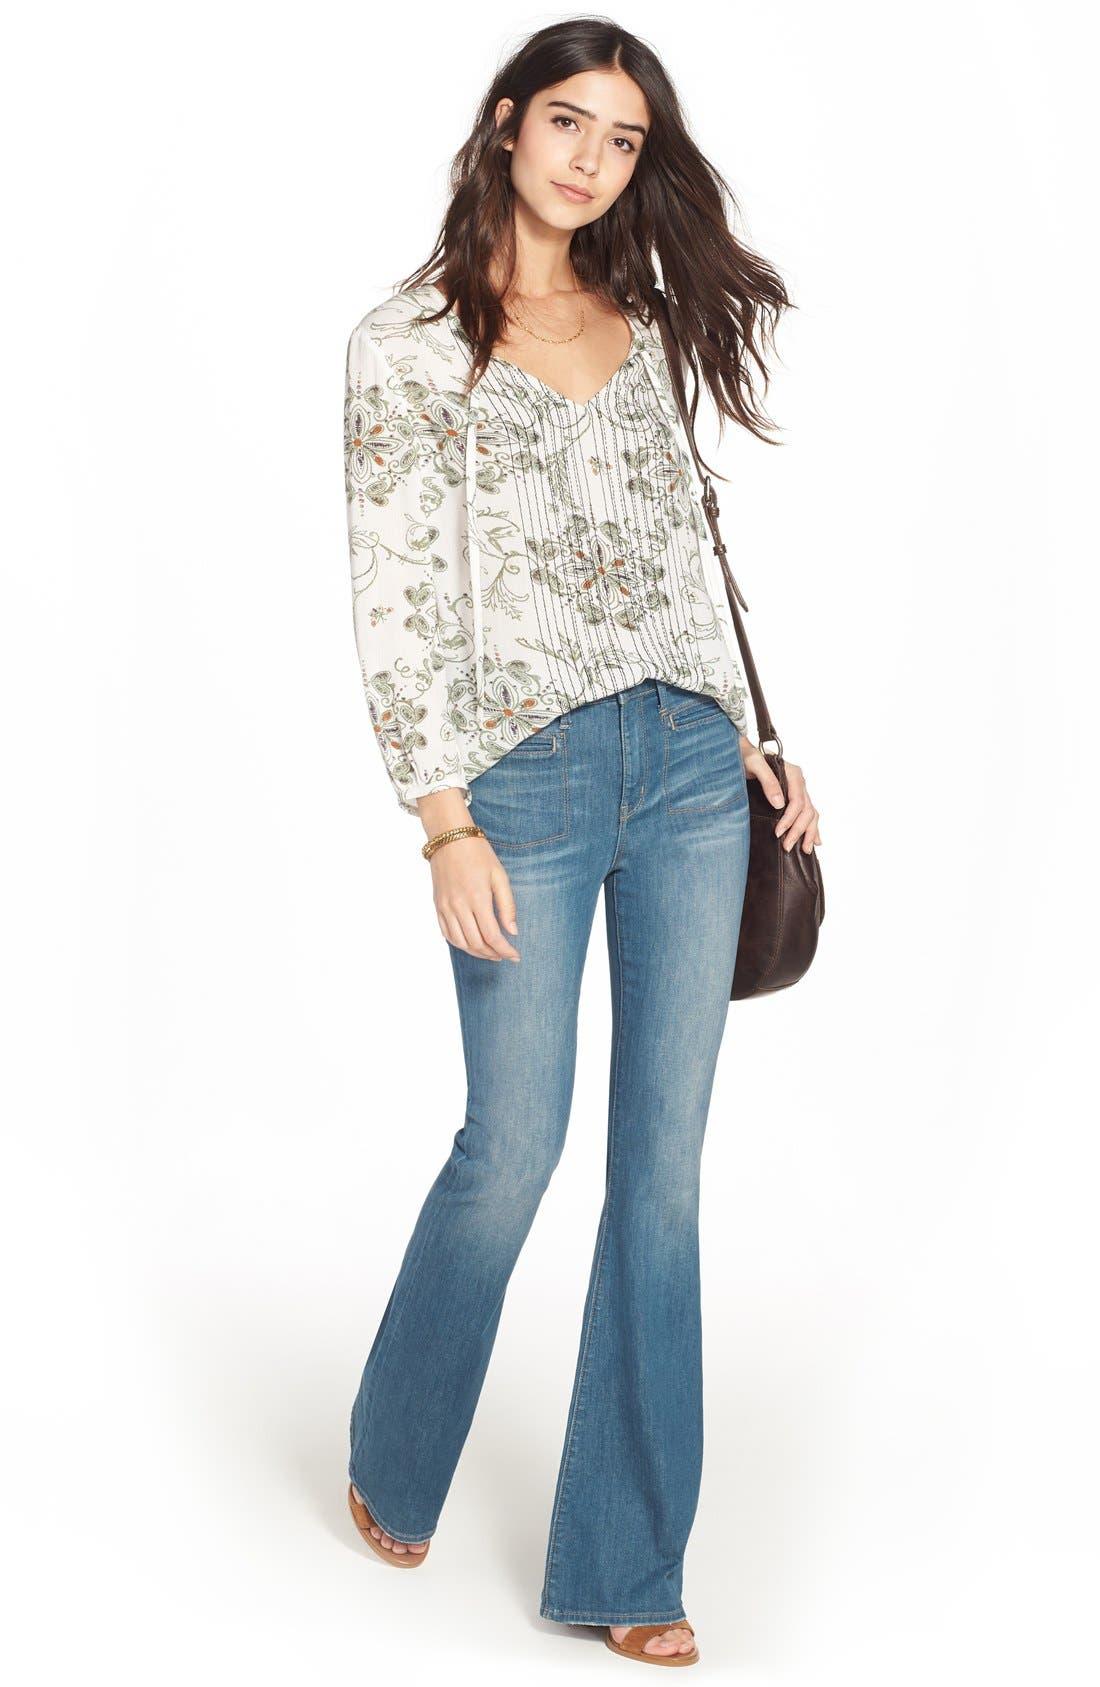 Treasure&Bond High Rise Skinny Flare Jeans,                             Alternate thumbnail 2, color,                             400